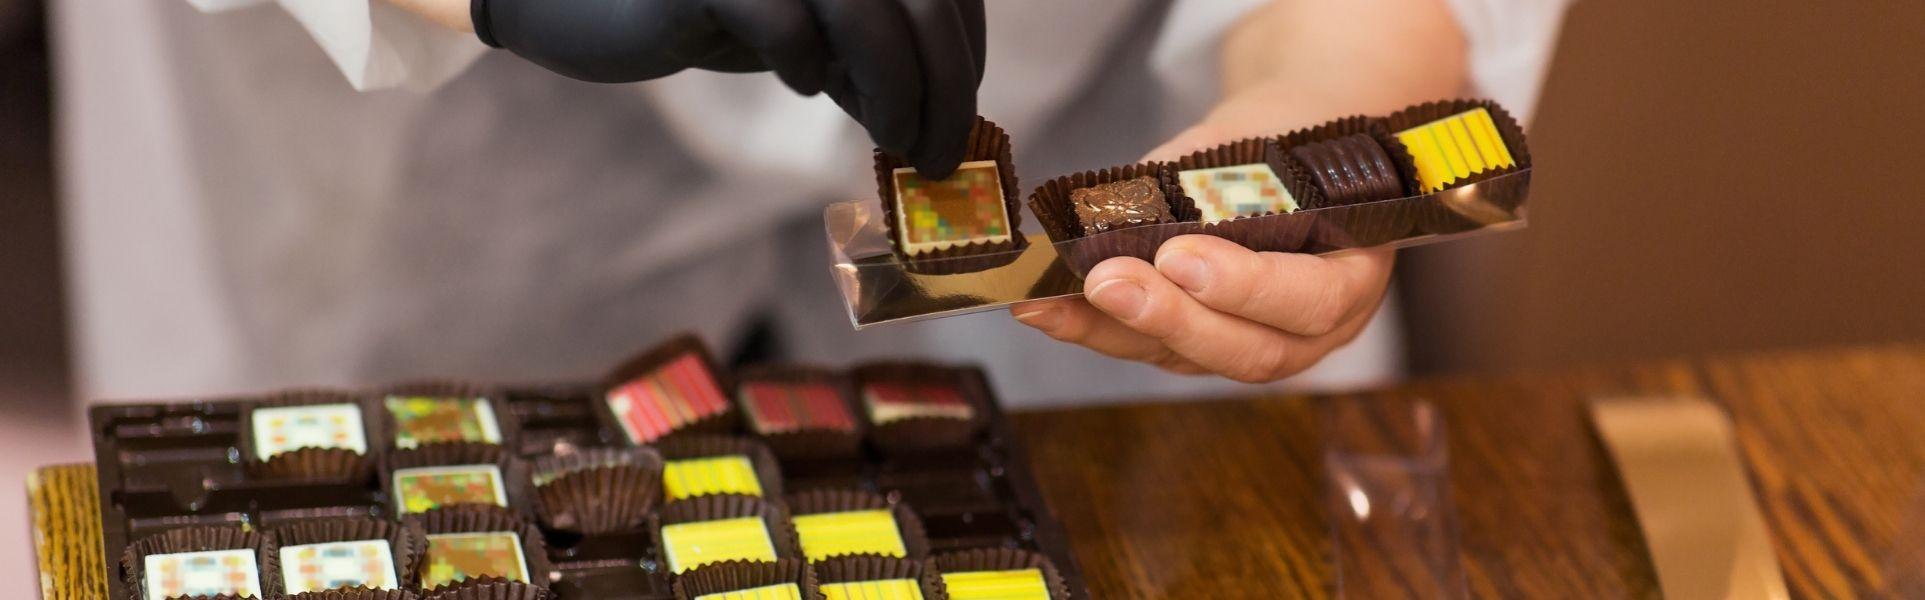 chocolats et confiseries export